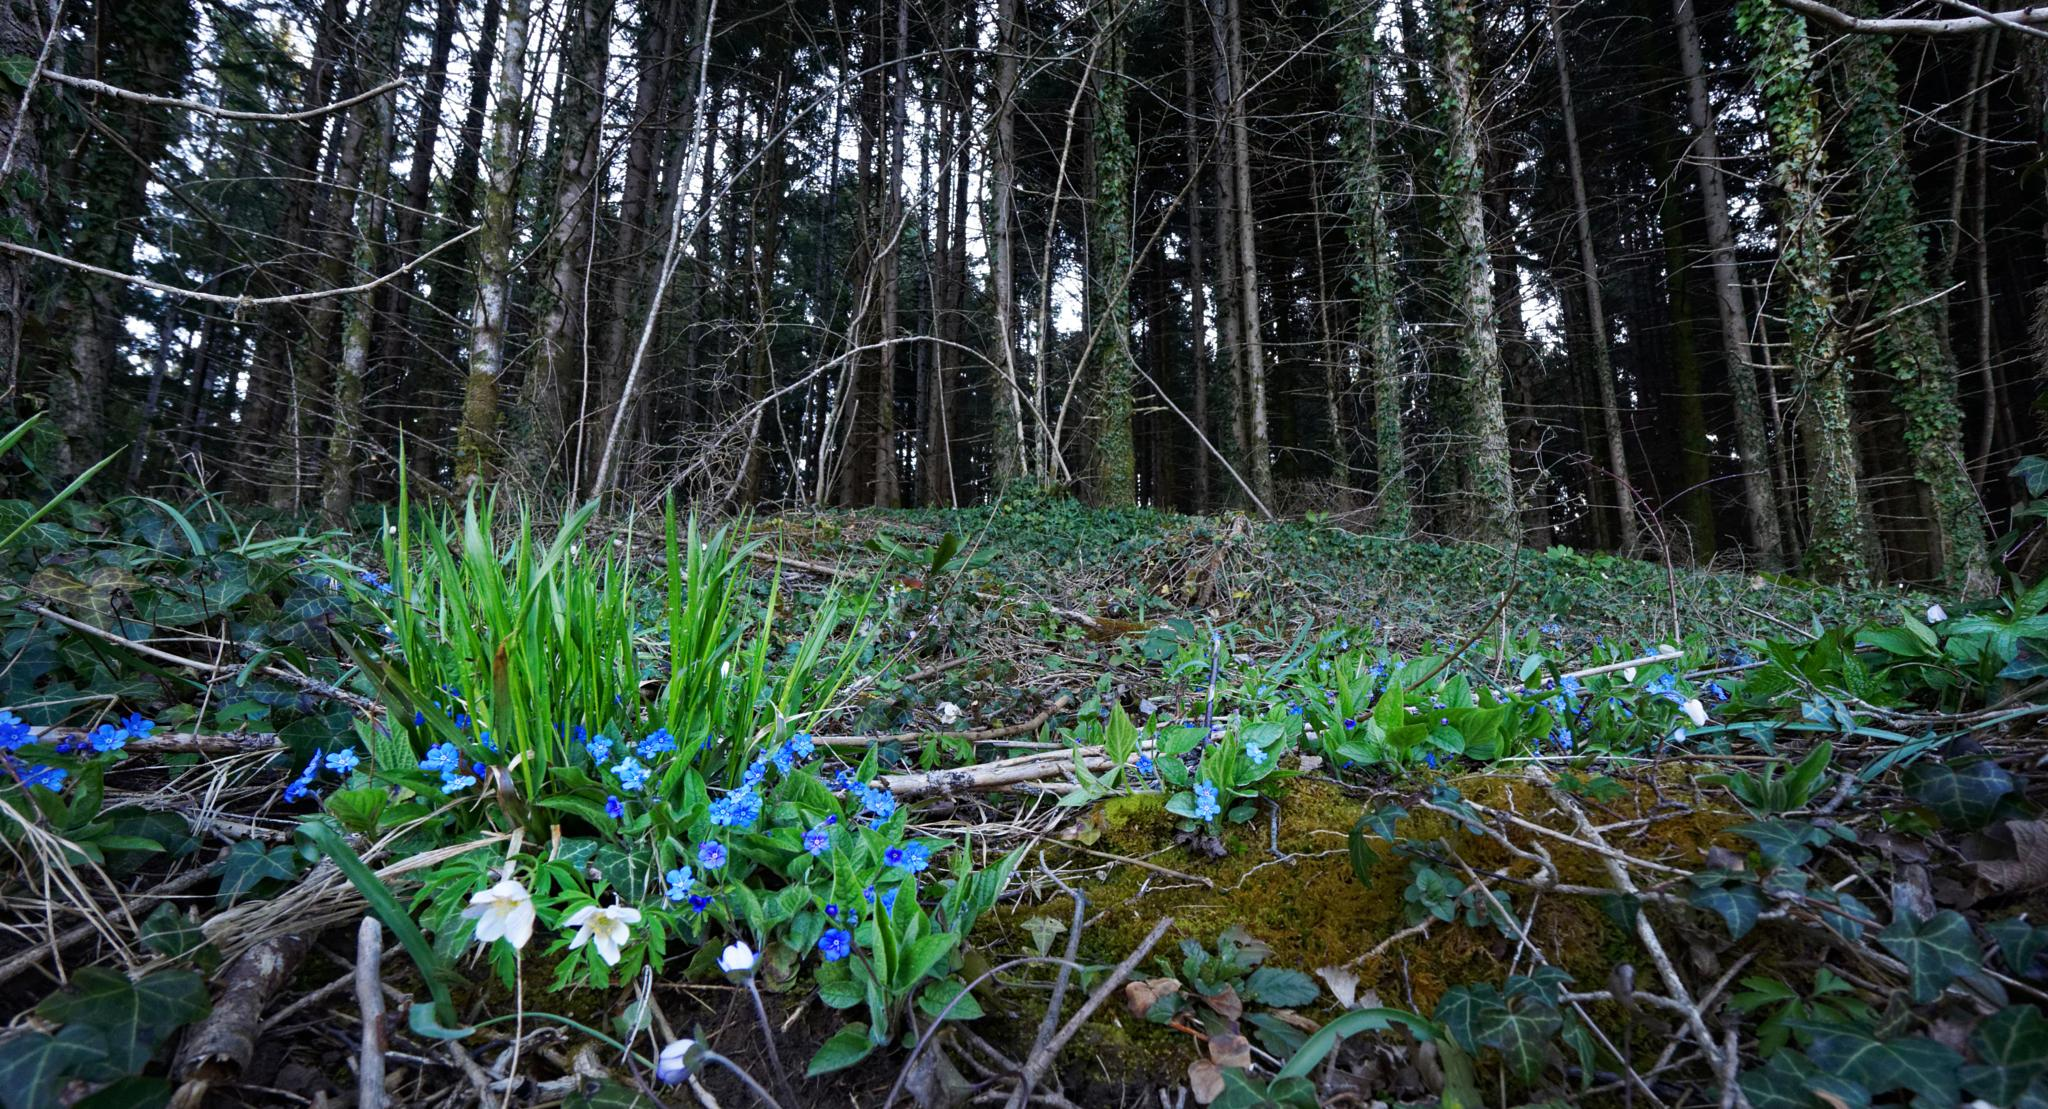 Flowering undergrowth by Marko Erman